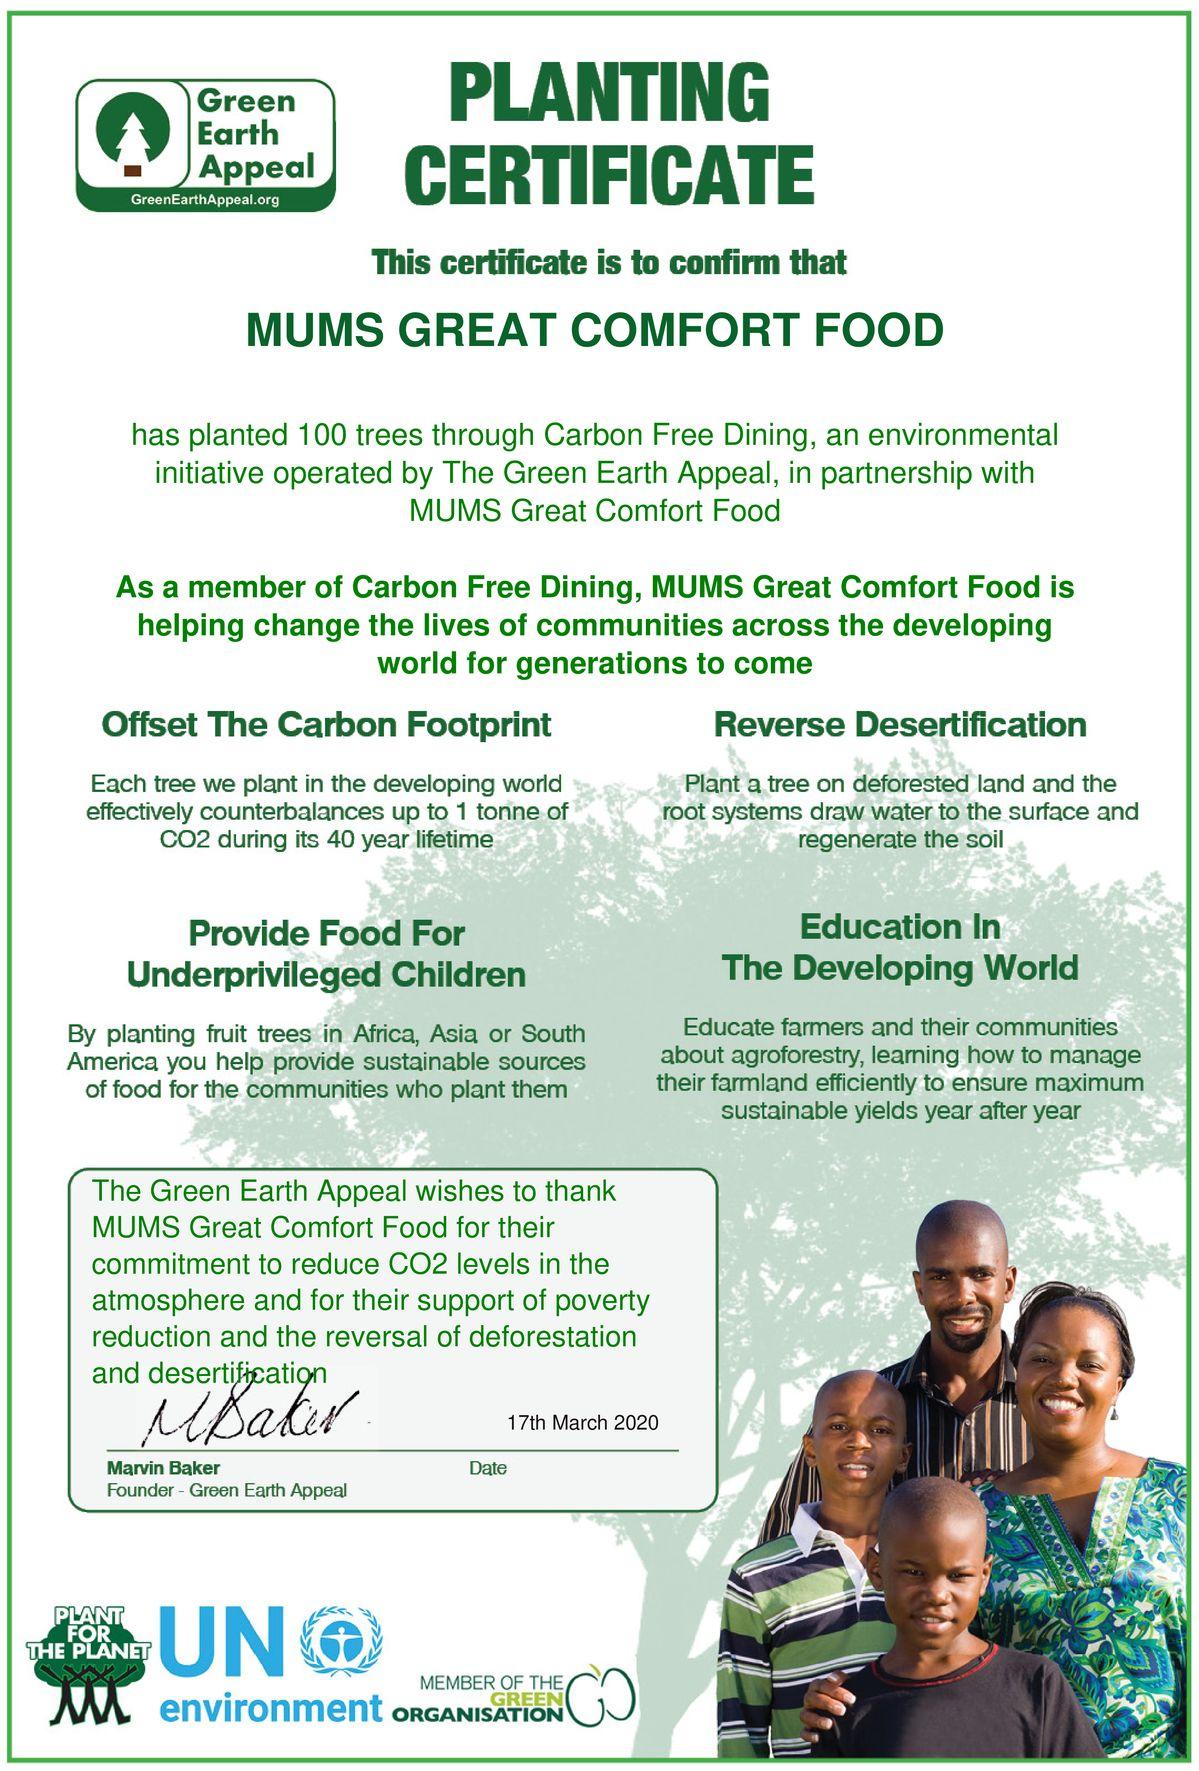 MUMS Great Comfort Food